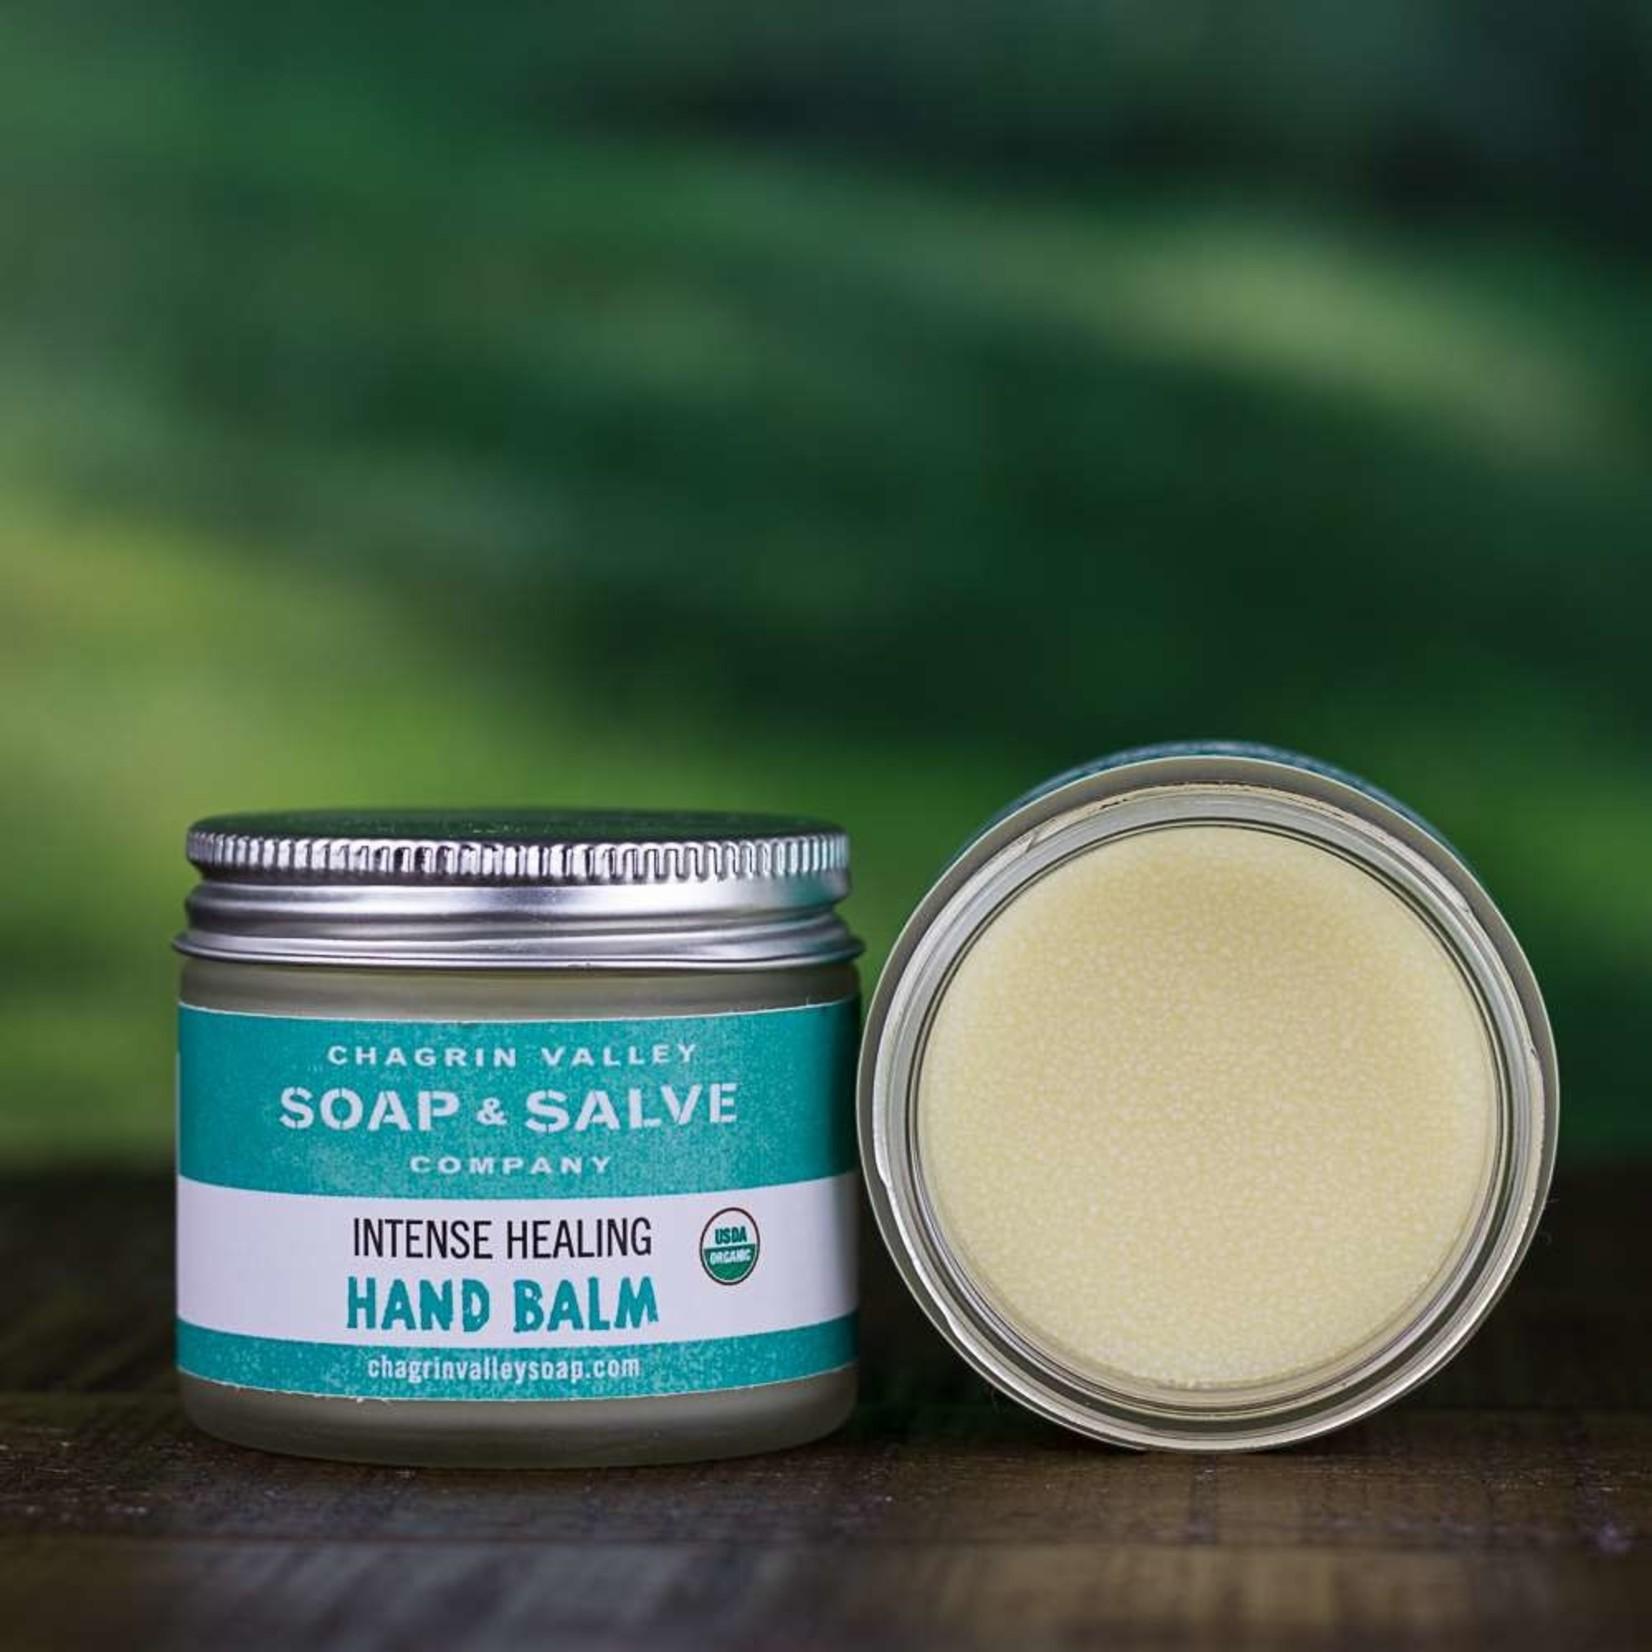 Chagrin Valley Soap and Salve Intense Healing Hand Balm